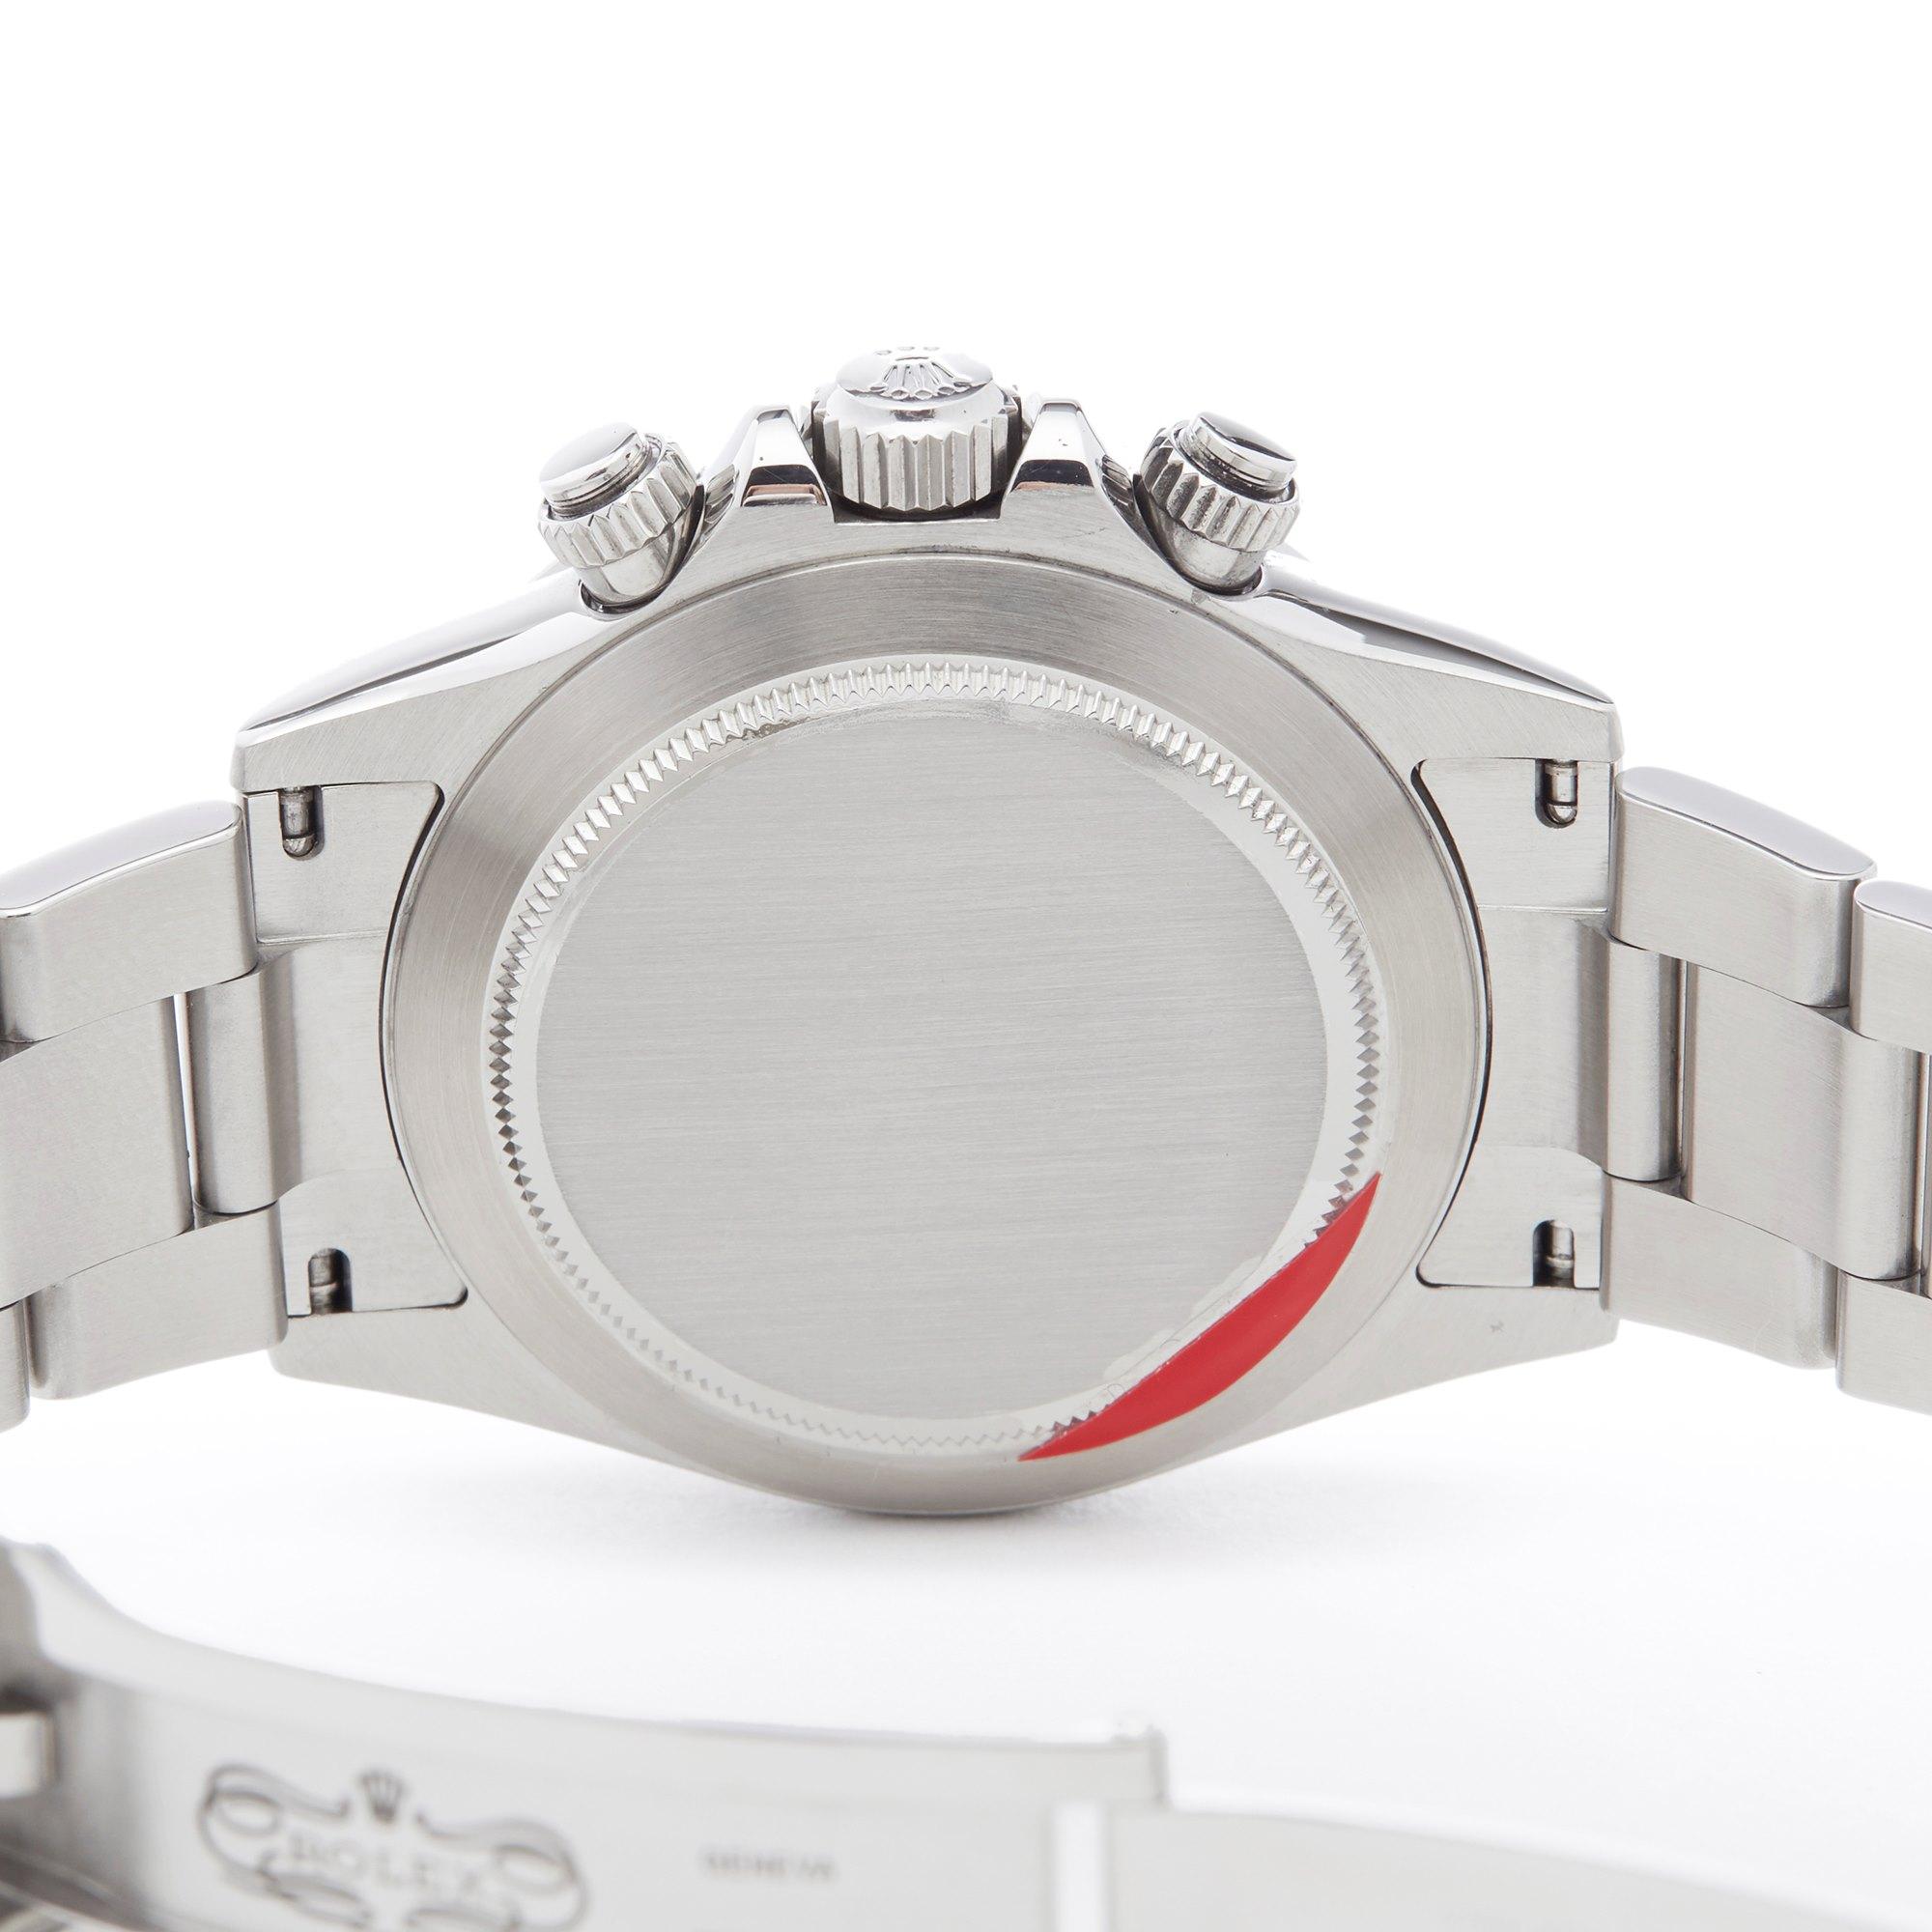 Rolex Daytona APH Chronograph Roestvrij Staal 116520